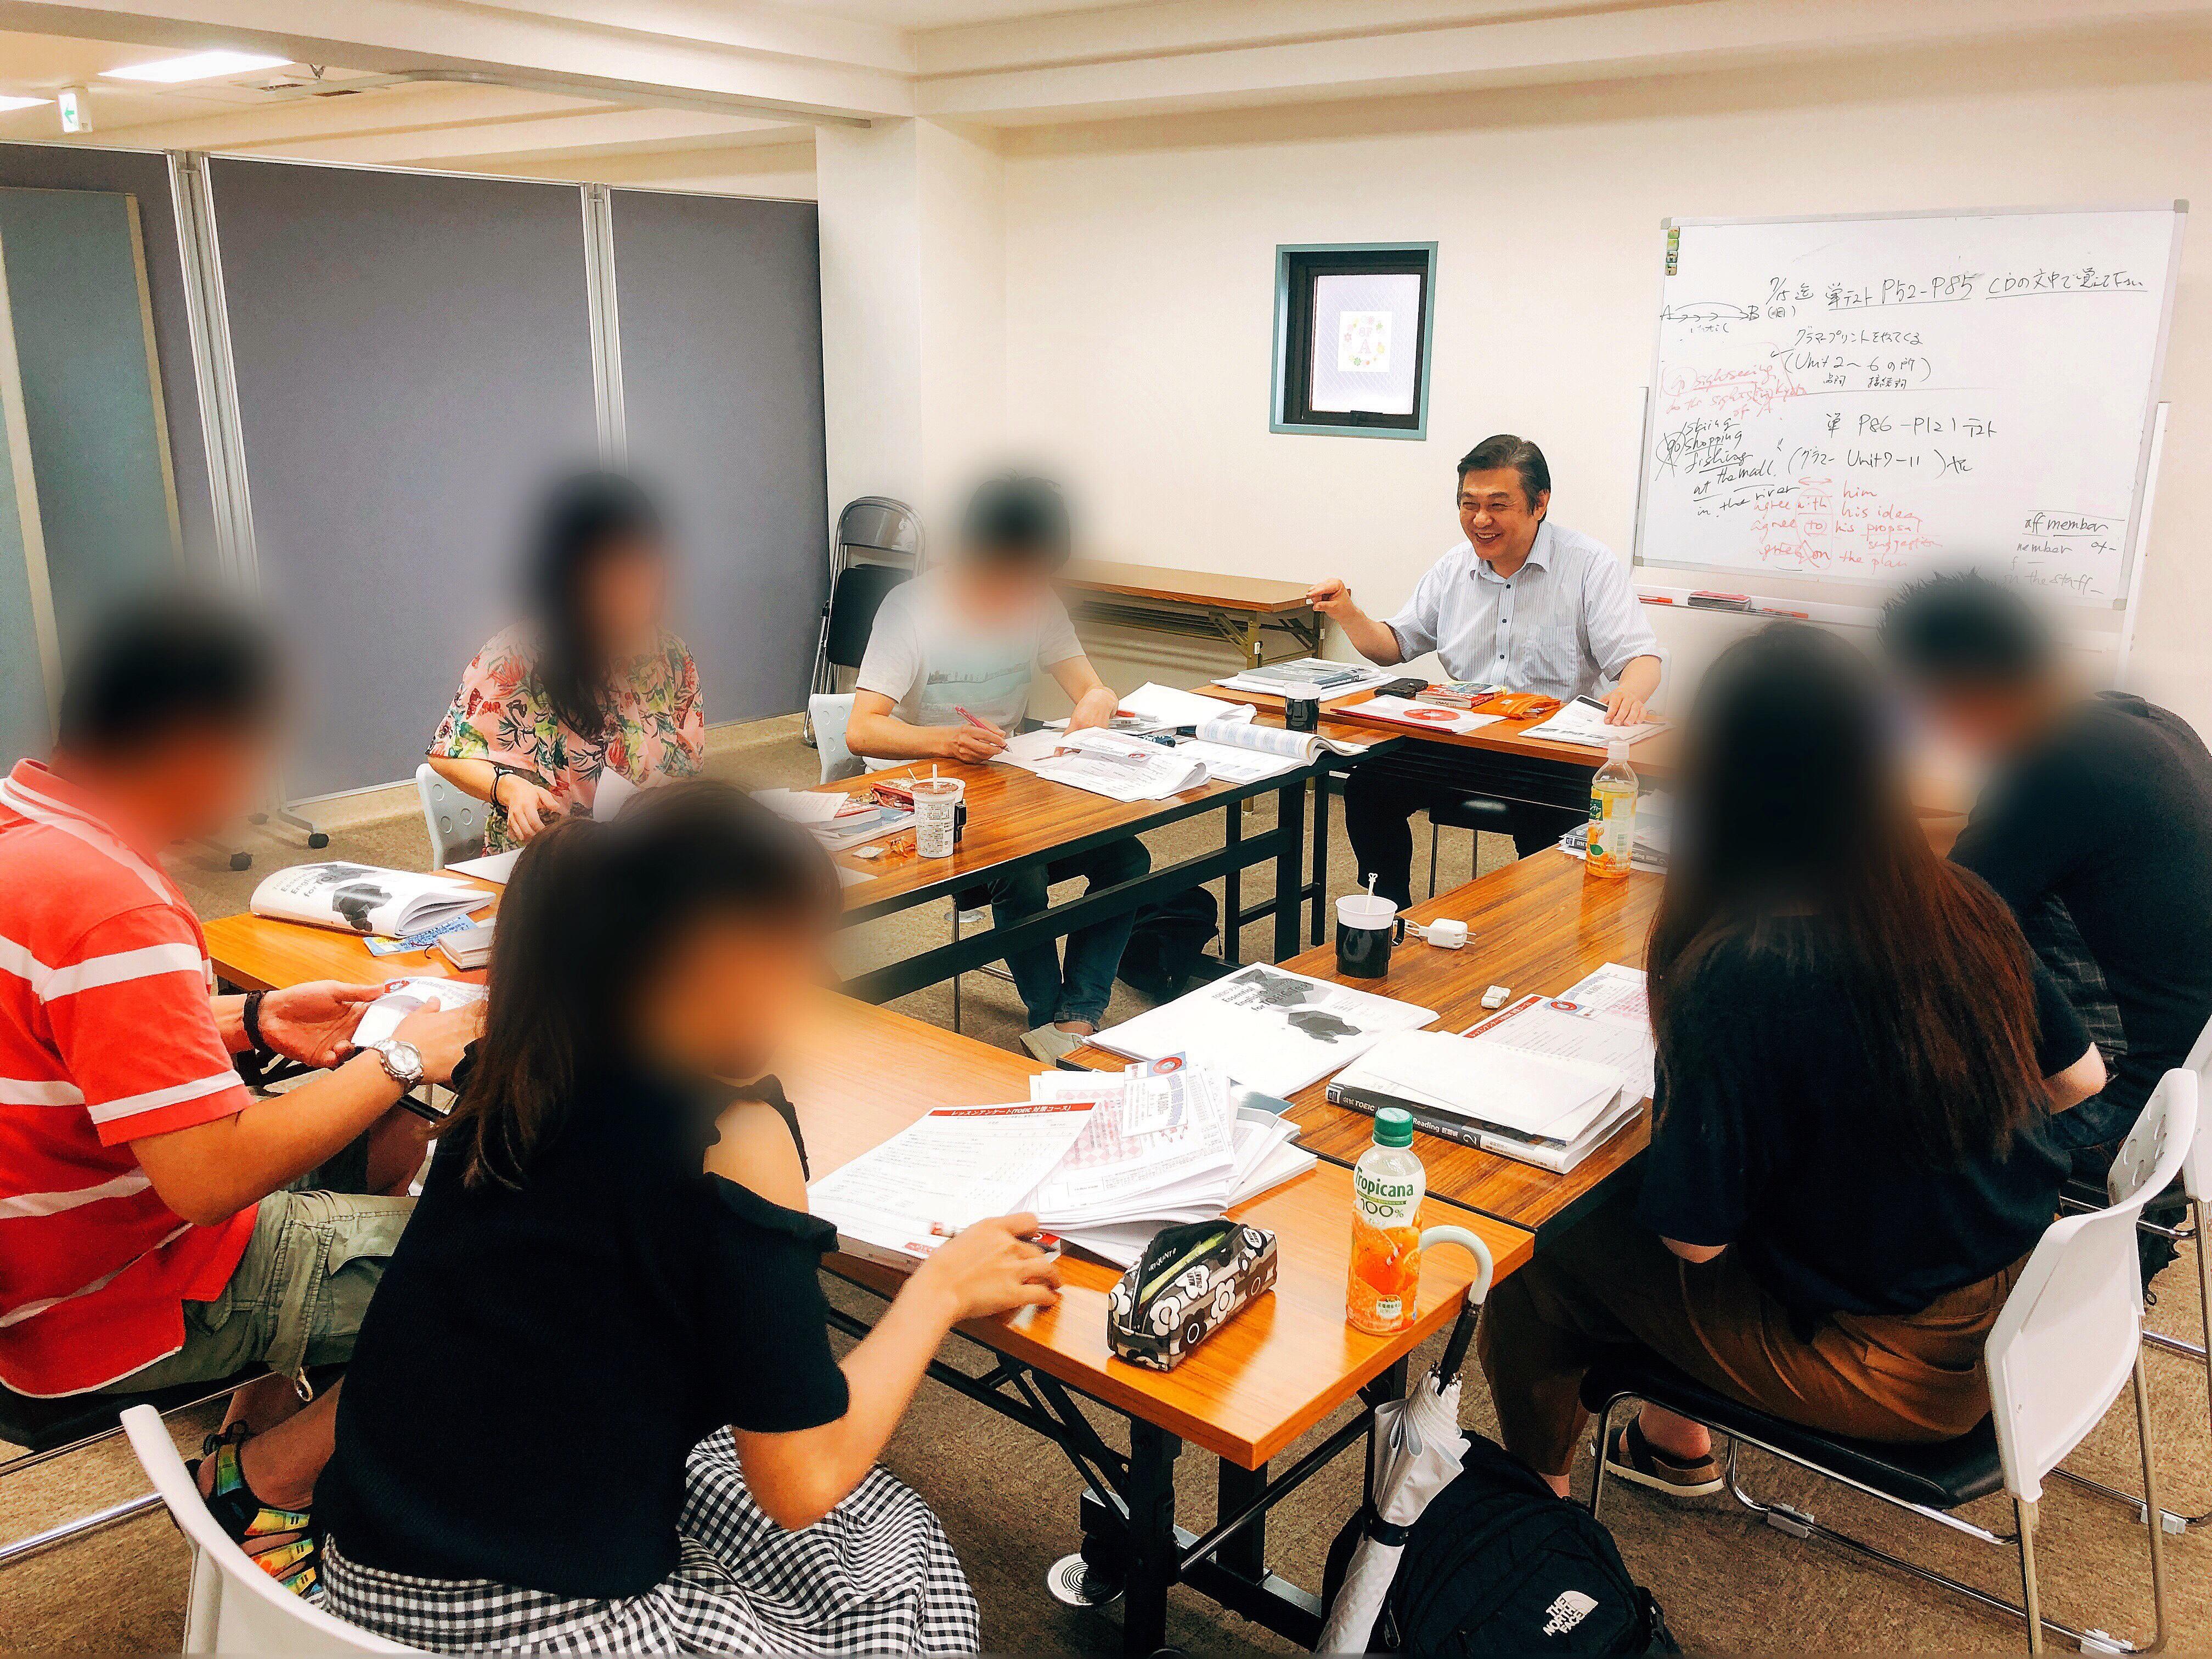 大阪TOEIC短期集中講座「TOEIC 600・800点を目指す4日間集中講座」